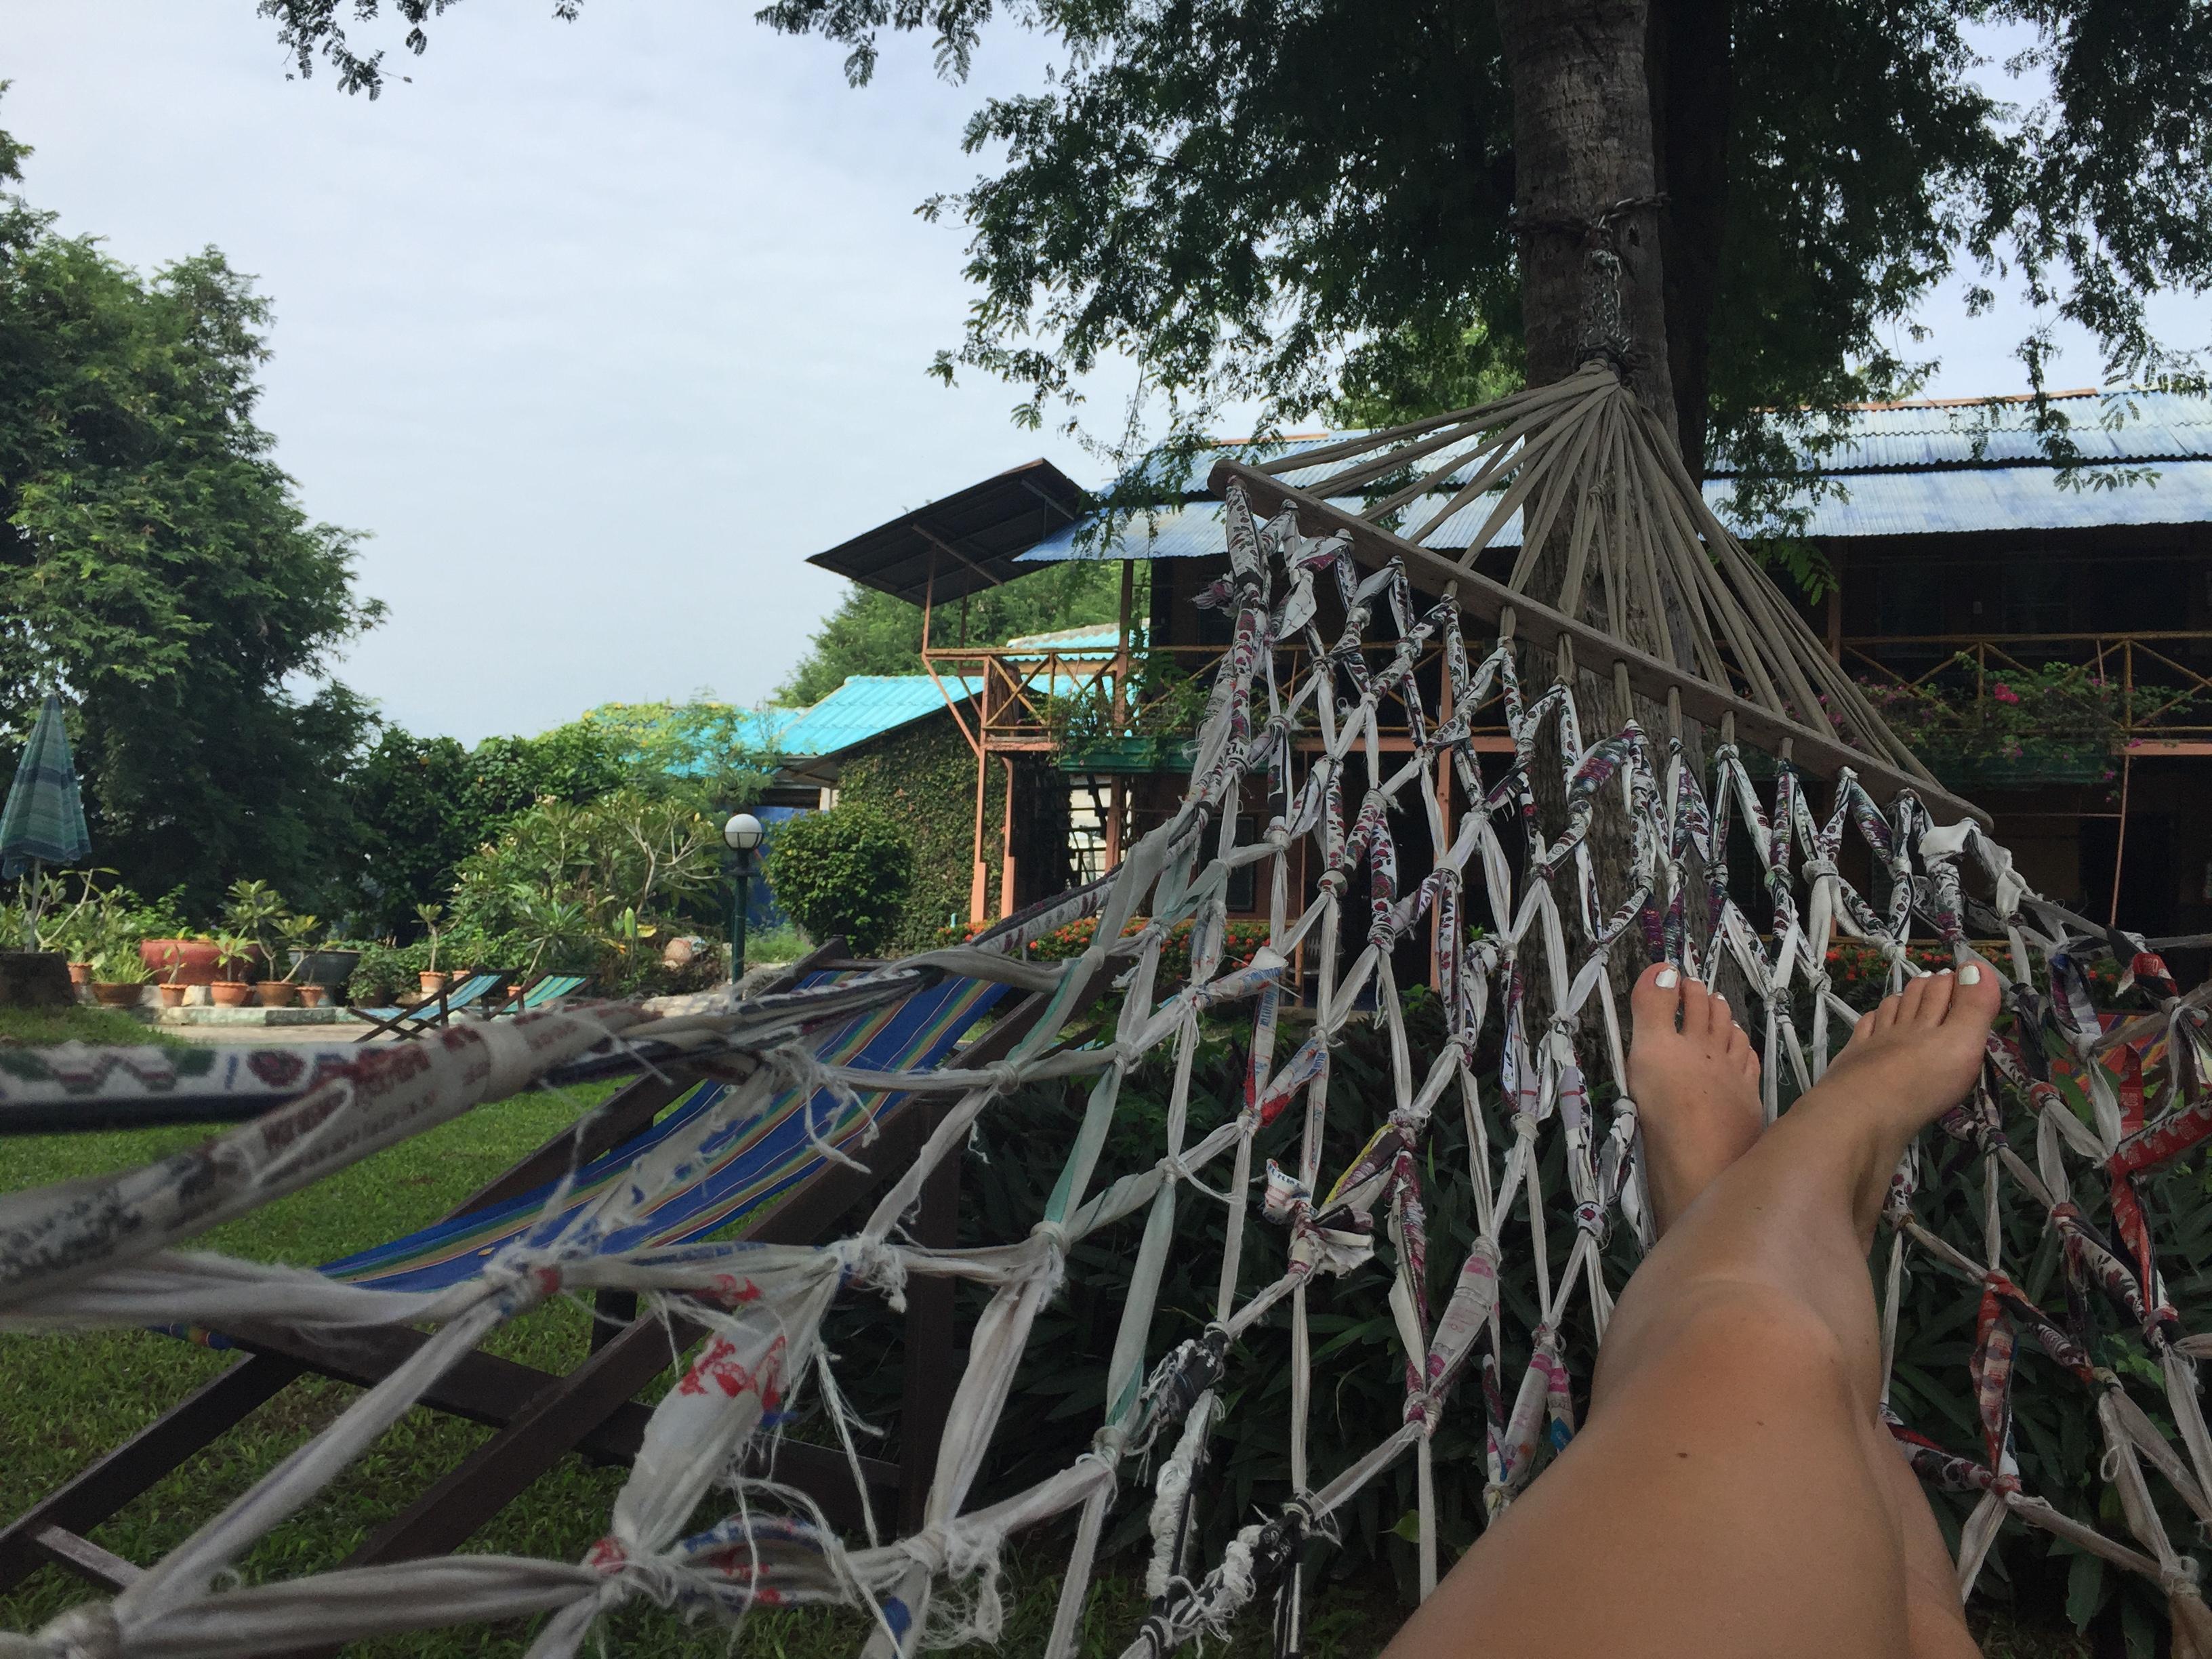 hammock, relax, Thailand, teach abroad, relax, XploreAsia